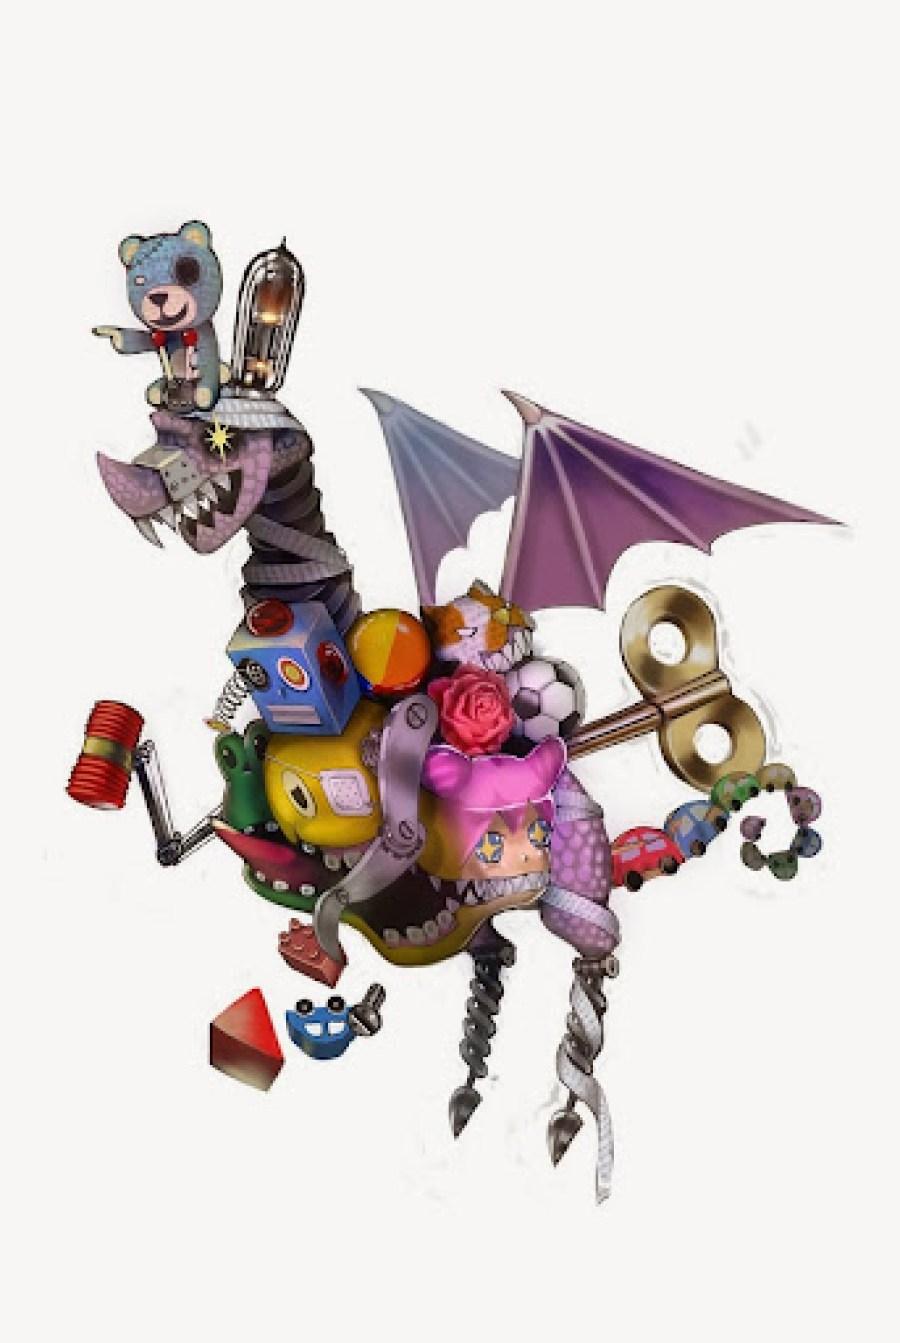 Ar_no_Surge_PlayStation-3_videogame_03